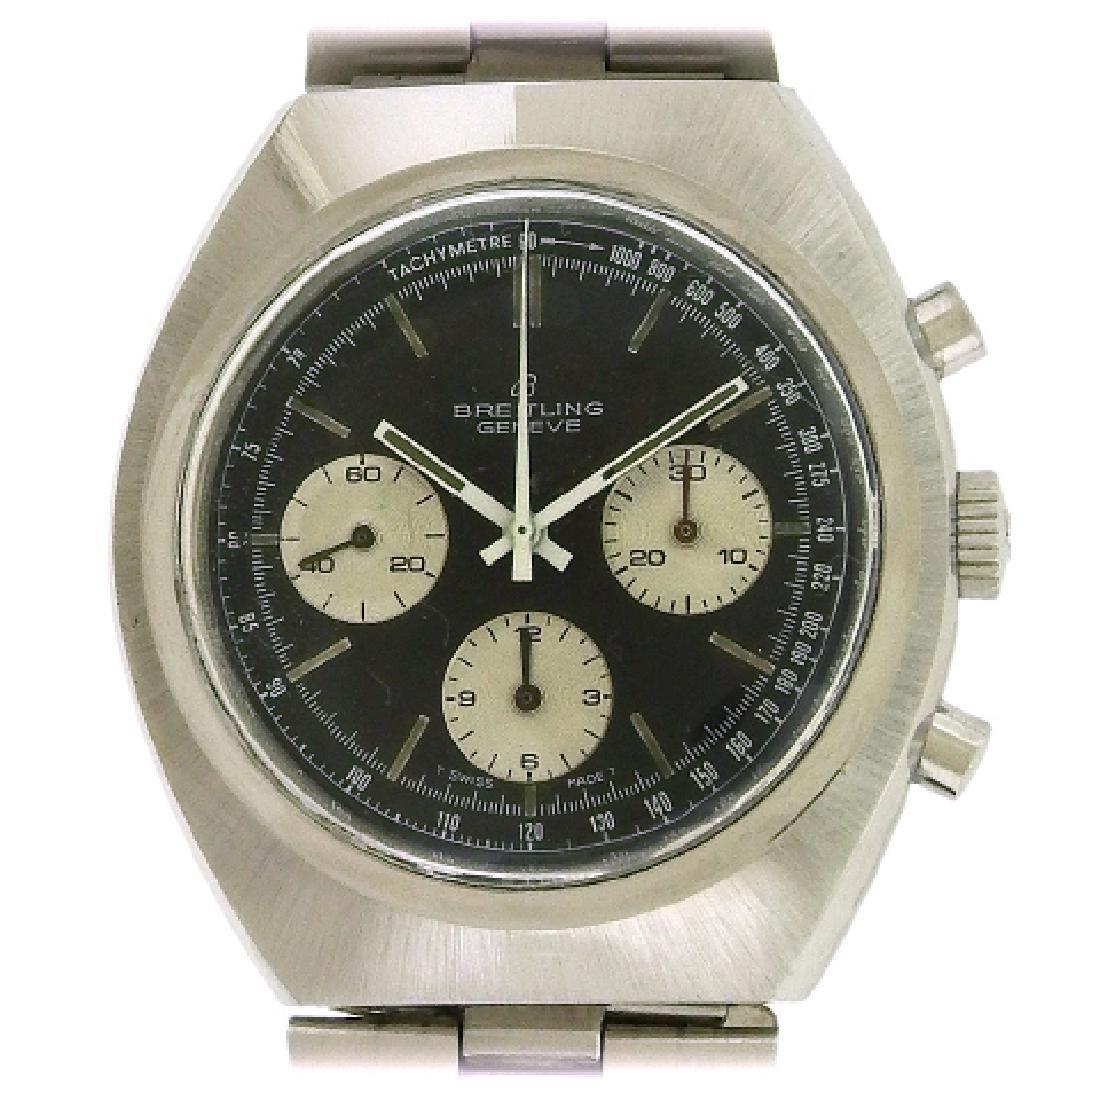 BREITLING | Chronograph Ref. 1450 | 1970s